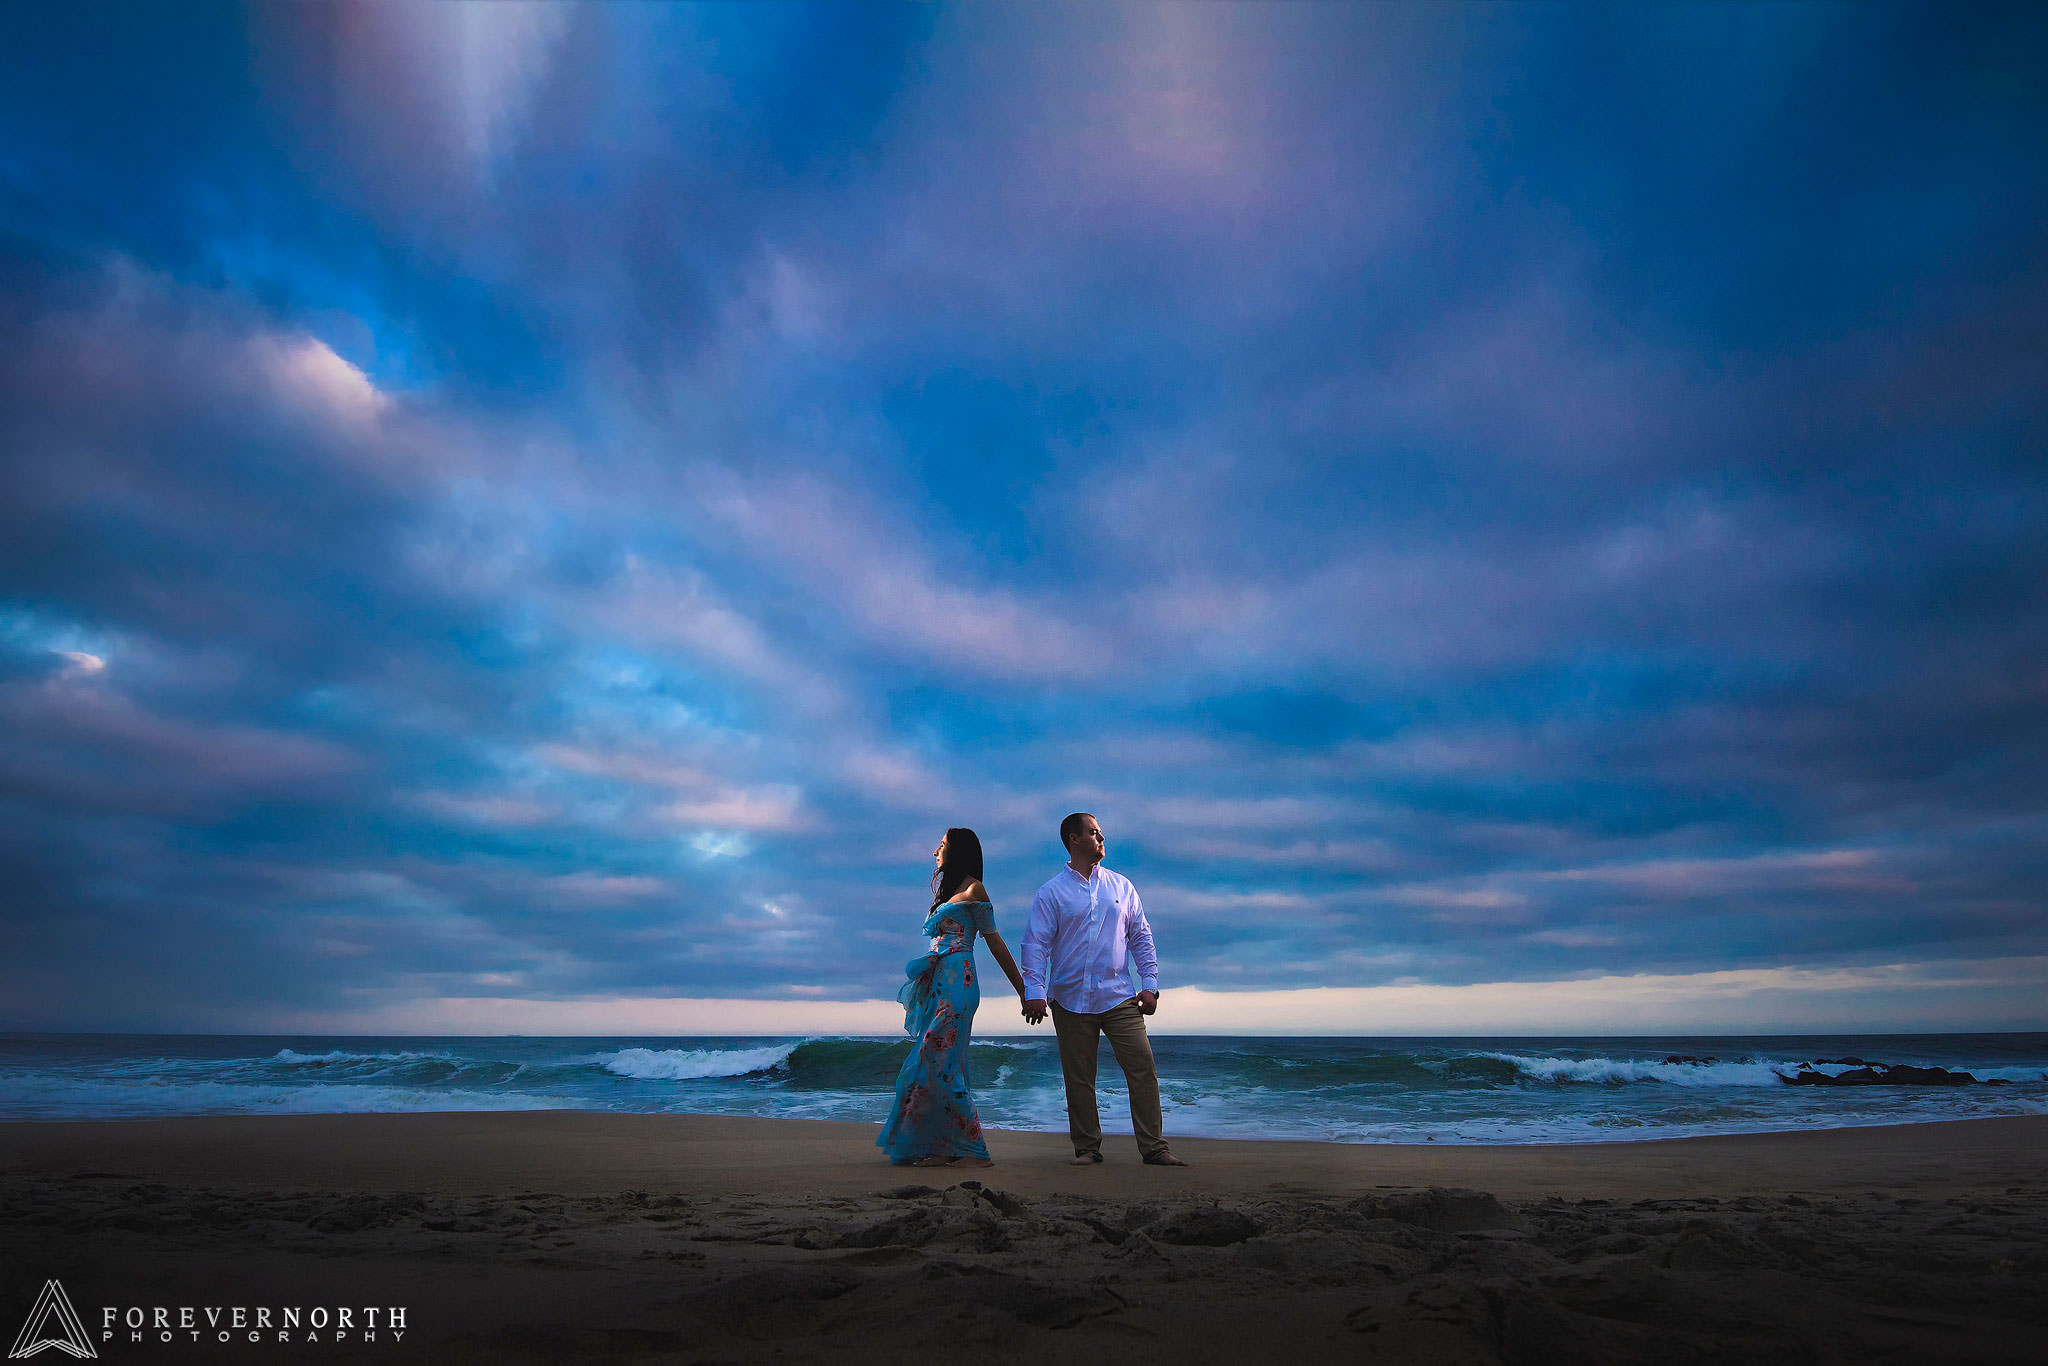 Martin-Manasquan-Beach-Engagement-Photos-01.jpg